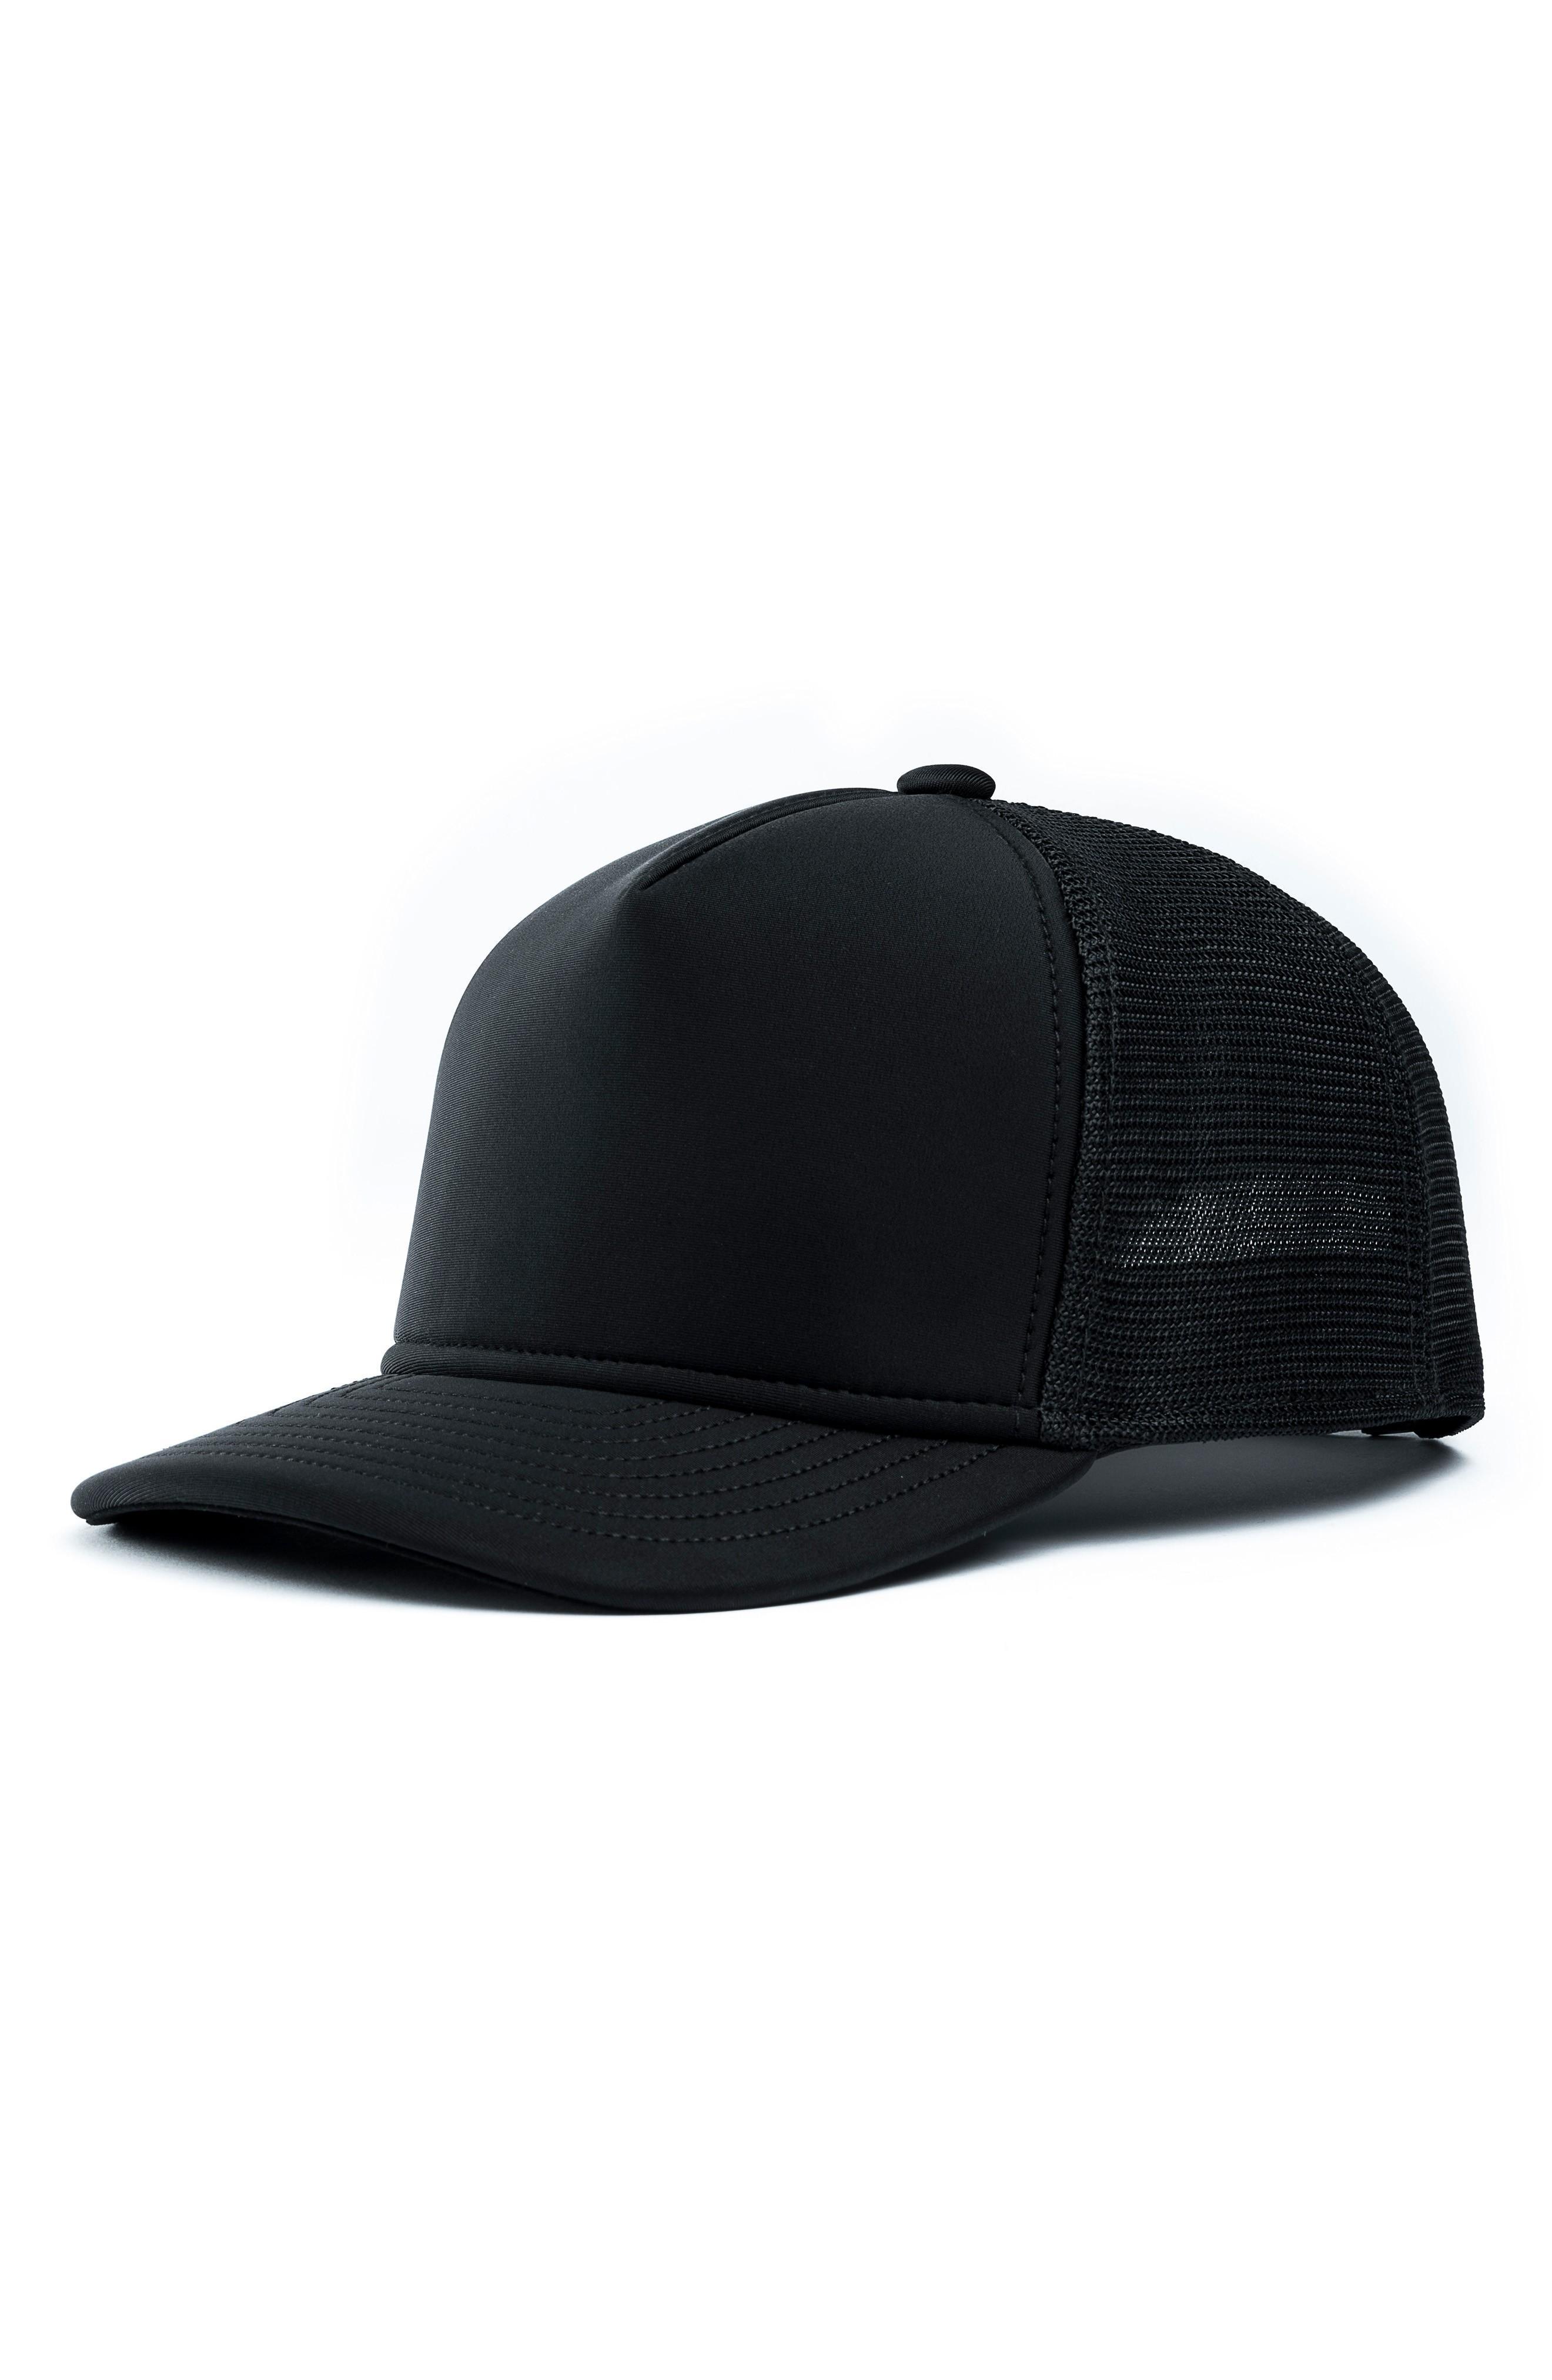 innovative design 56ffe 82fee Melin The Marksman Mesh Cap In Black